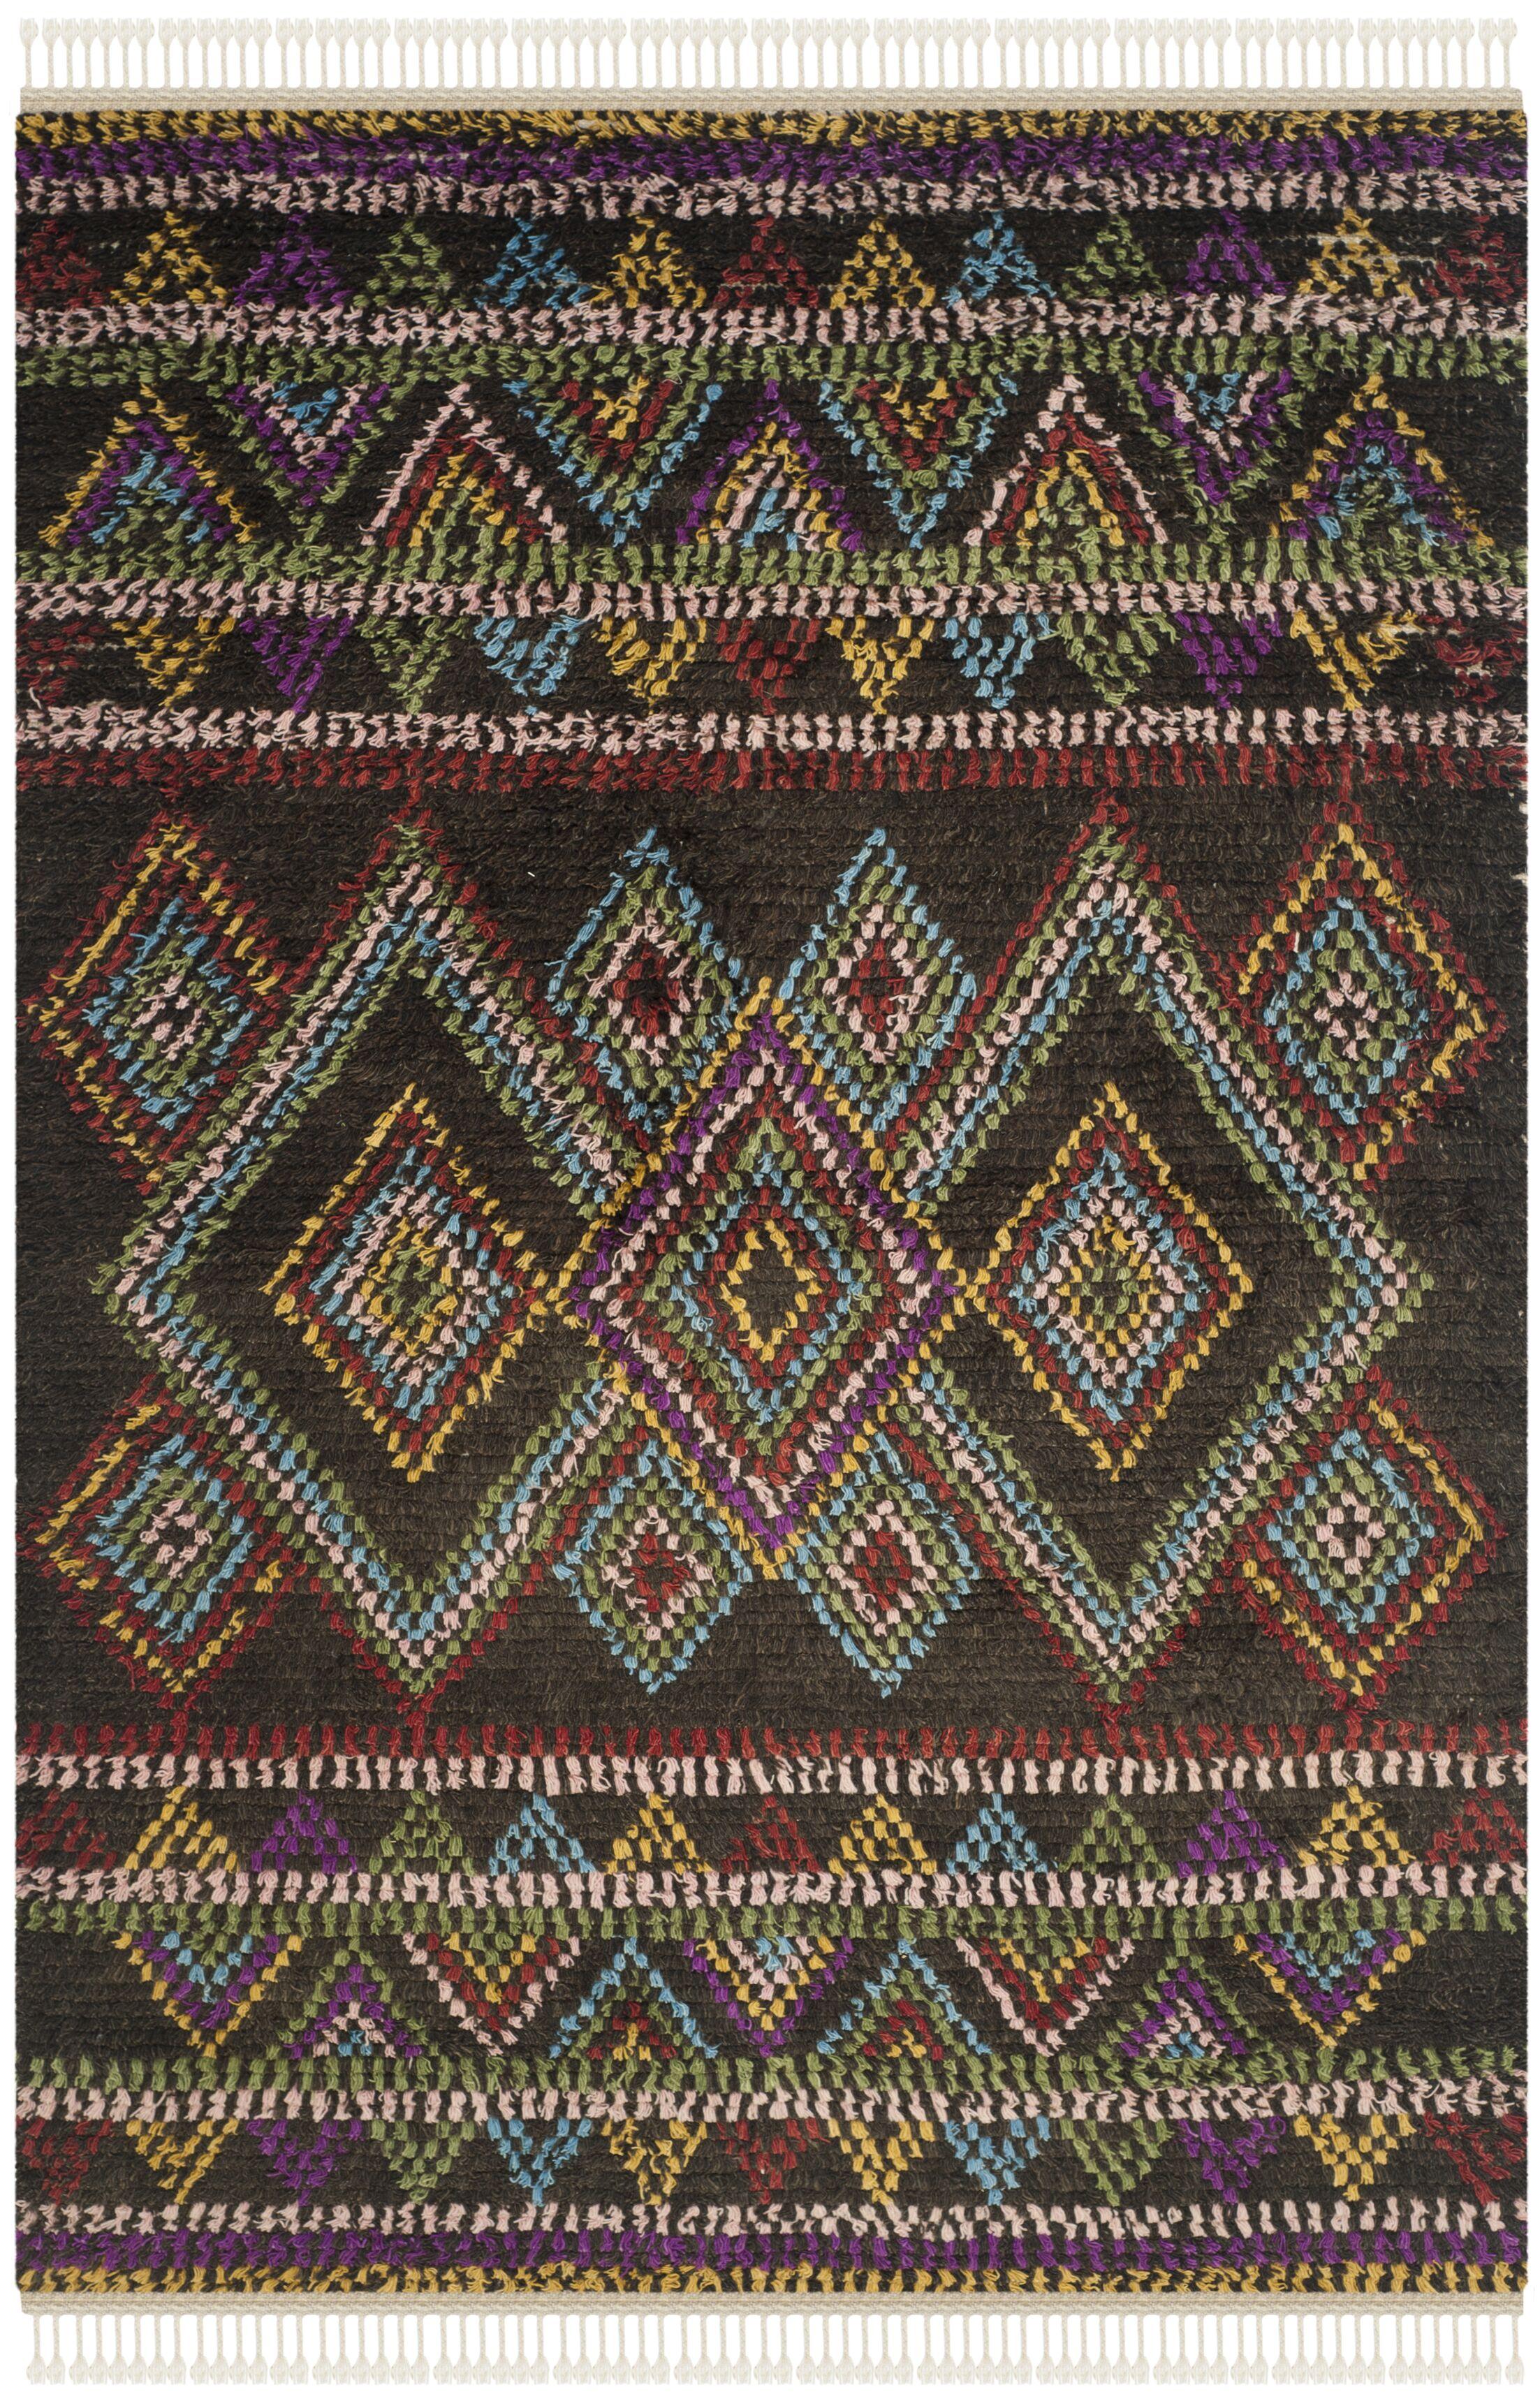 Glenoe Multi Geometric Rug Rug Size: Rectangle 6' x 9'